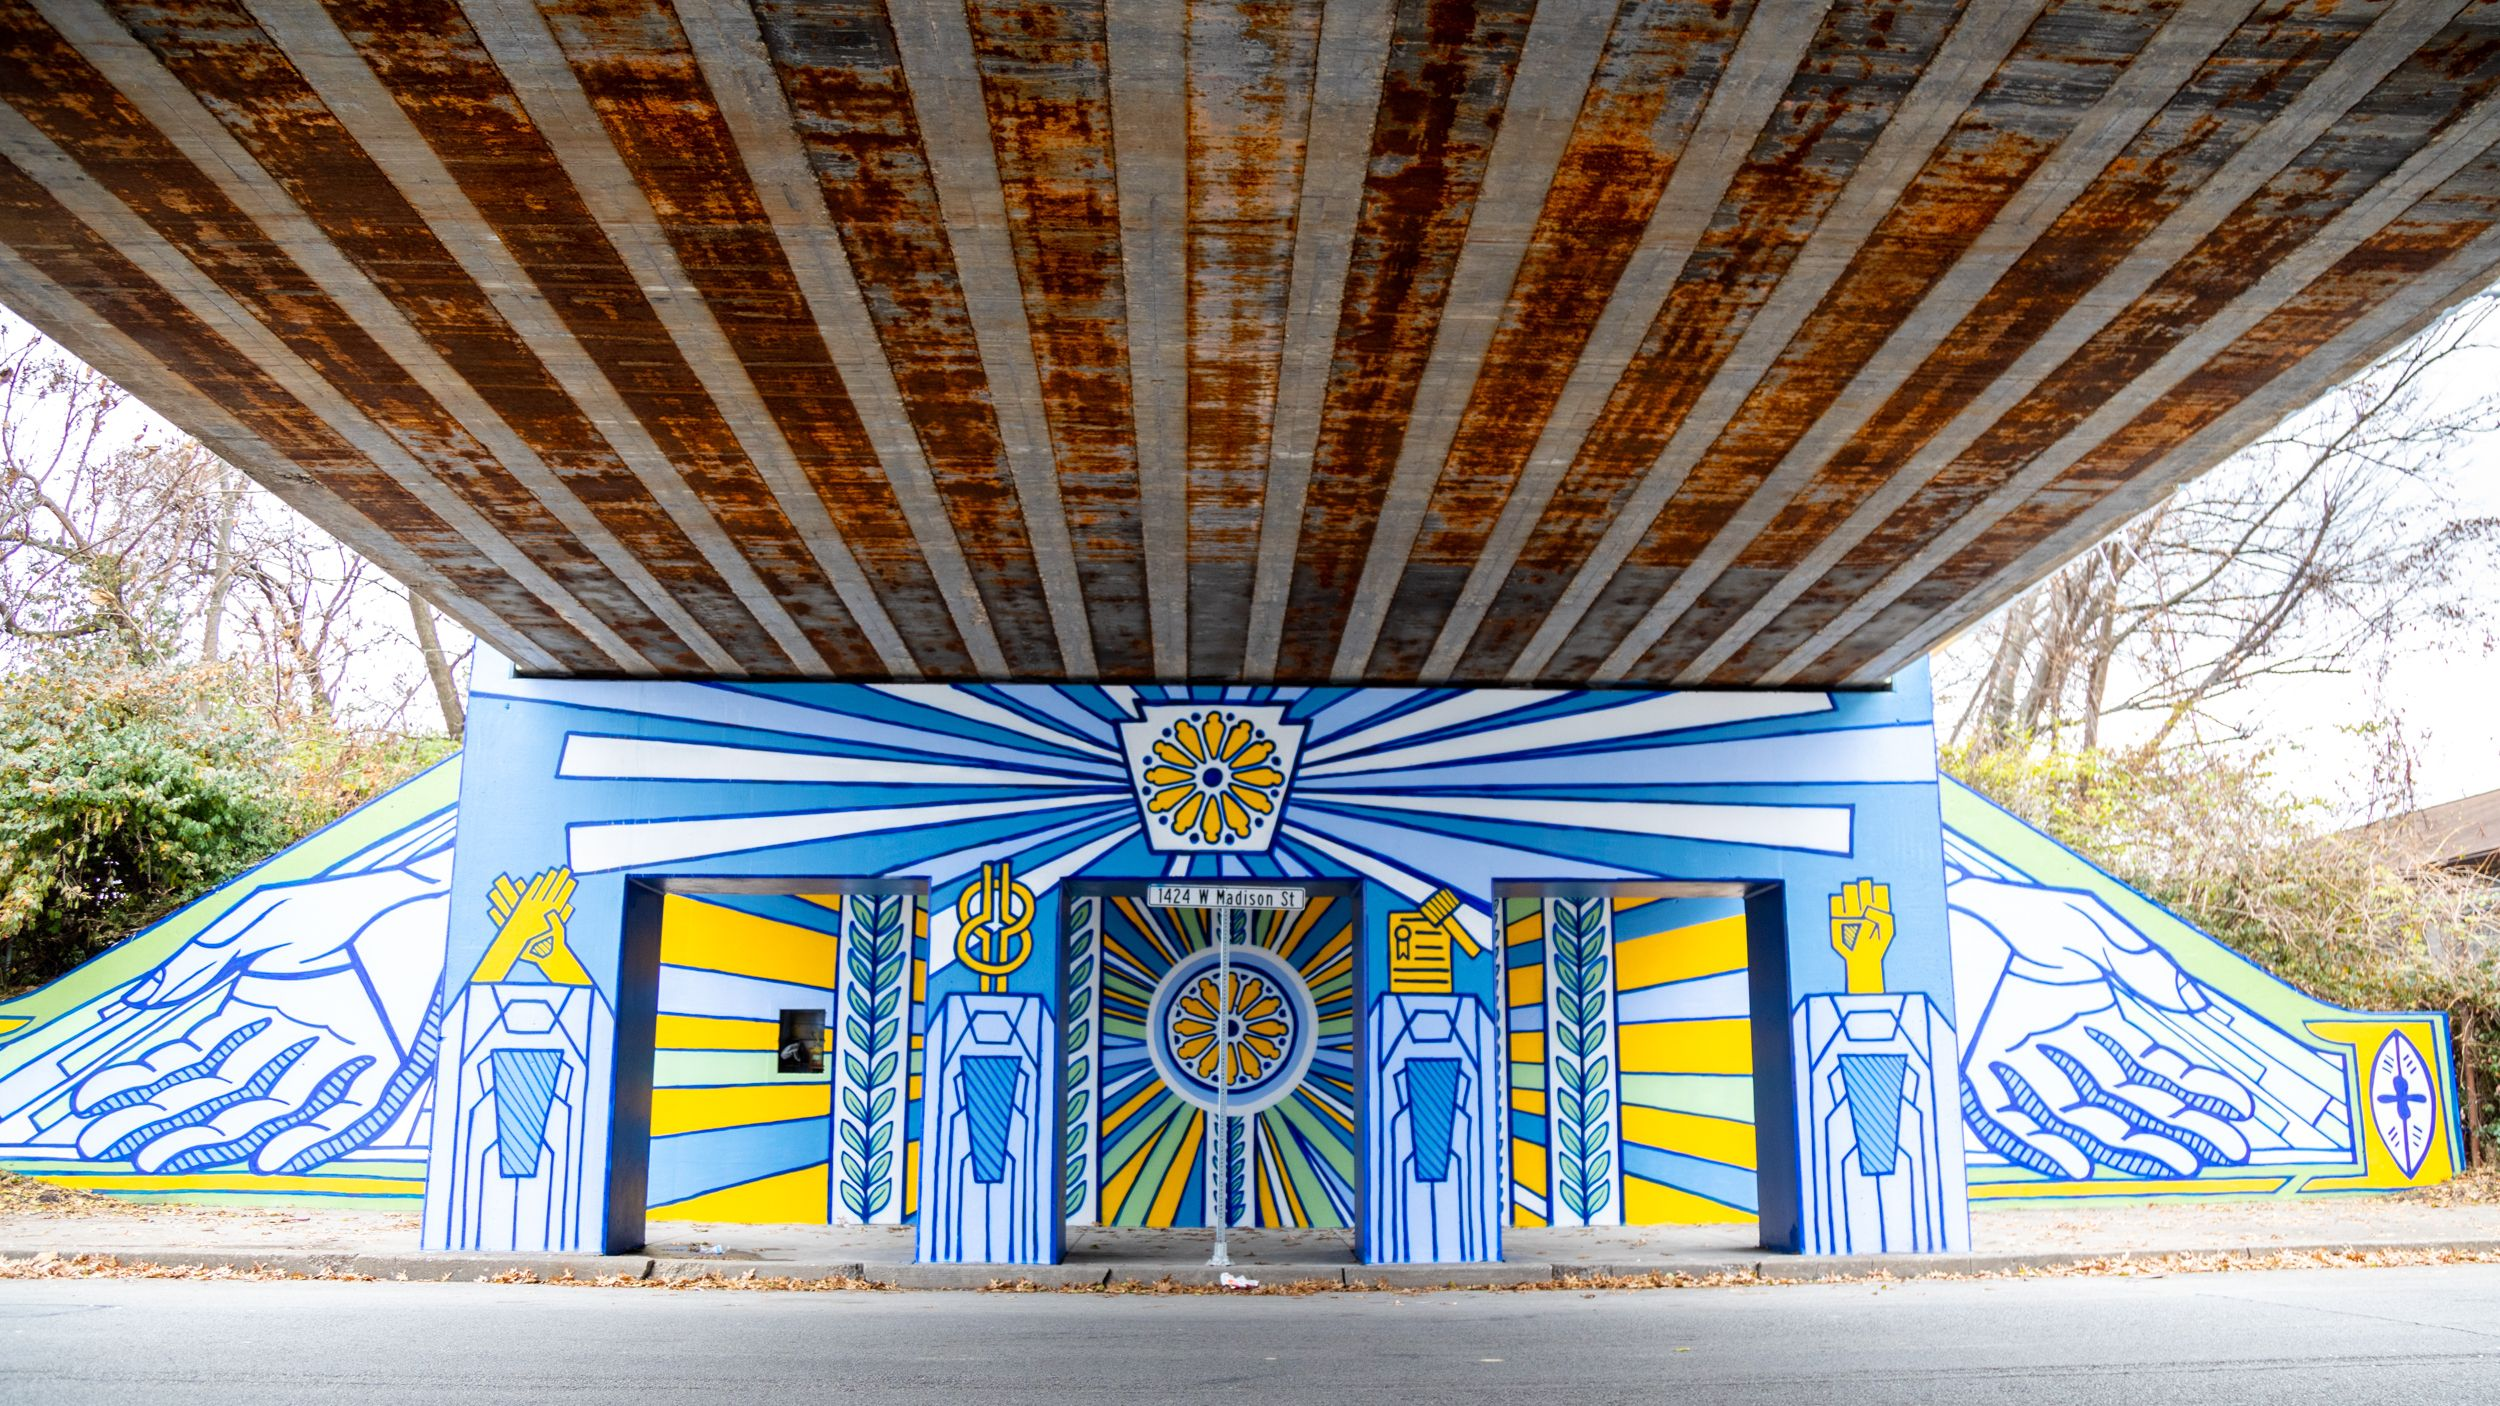 temple-of-community-mural-6.jpg